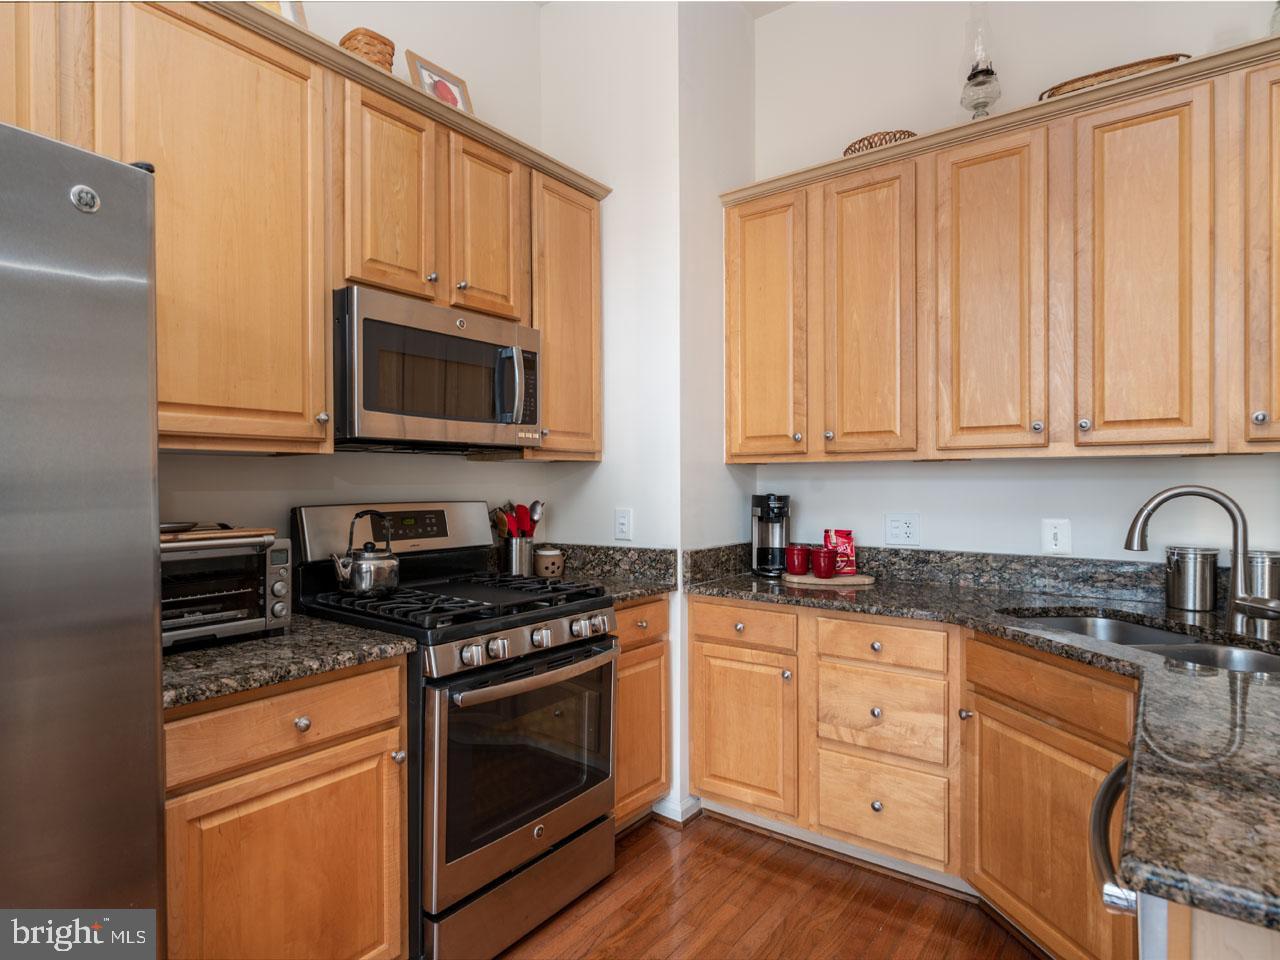 VAFX1104336-302201657598-2021-07-16-19-45-24  |   | Alexandria Delaware Real Estate For Sale | MLS# Vafx1104336  - Best of Northern Virginia